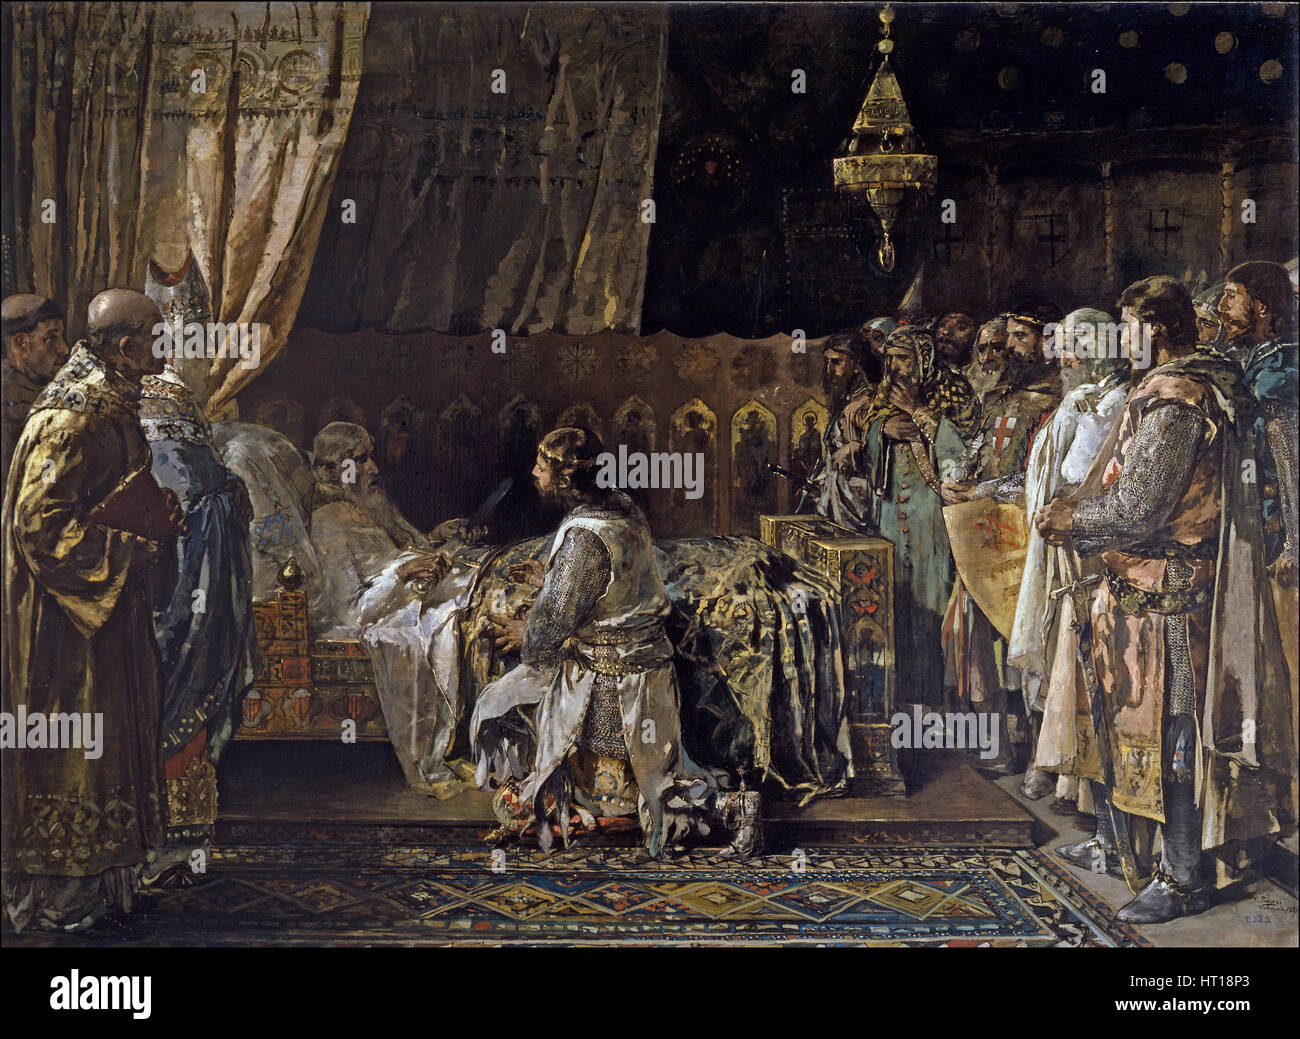 King James I the Conqueror Gives His Sword to His Son, Pedro, 1881. Artist: Pinazo Camarlench, Ignacio (1849-1916) - Stock Image